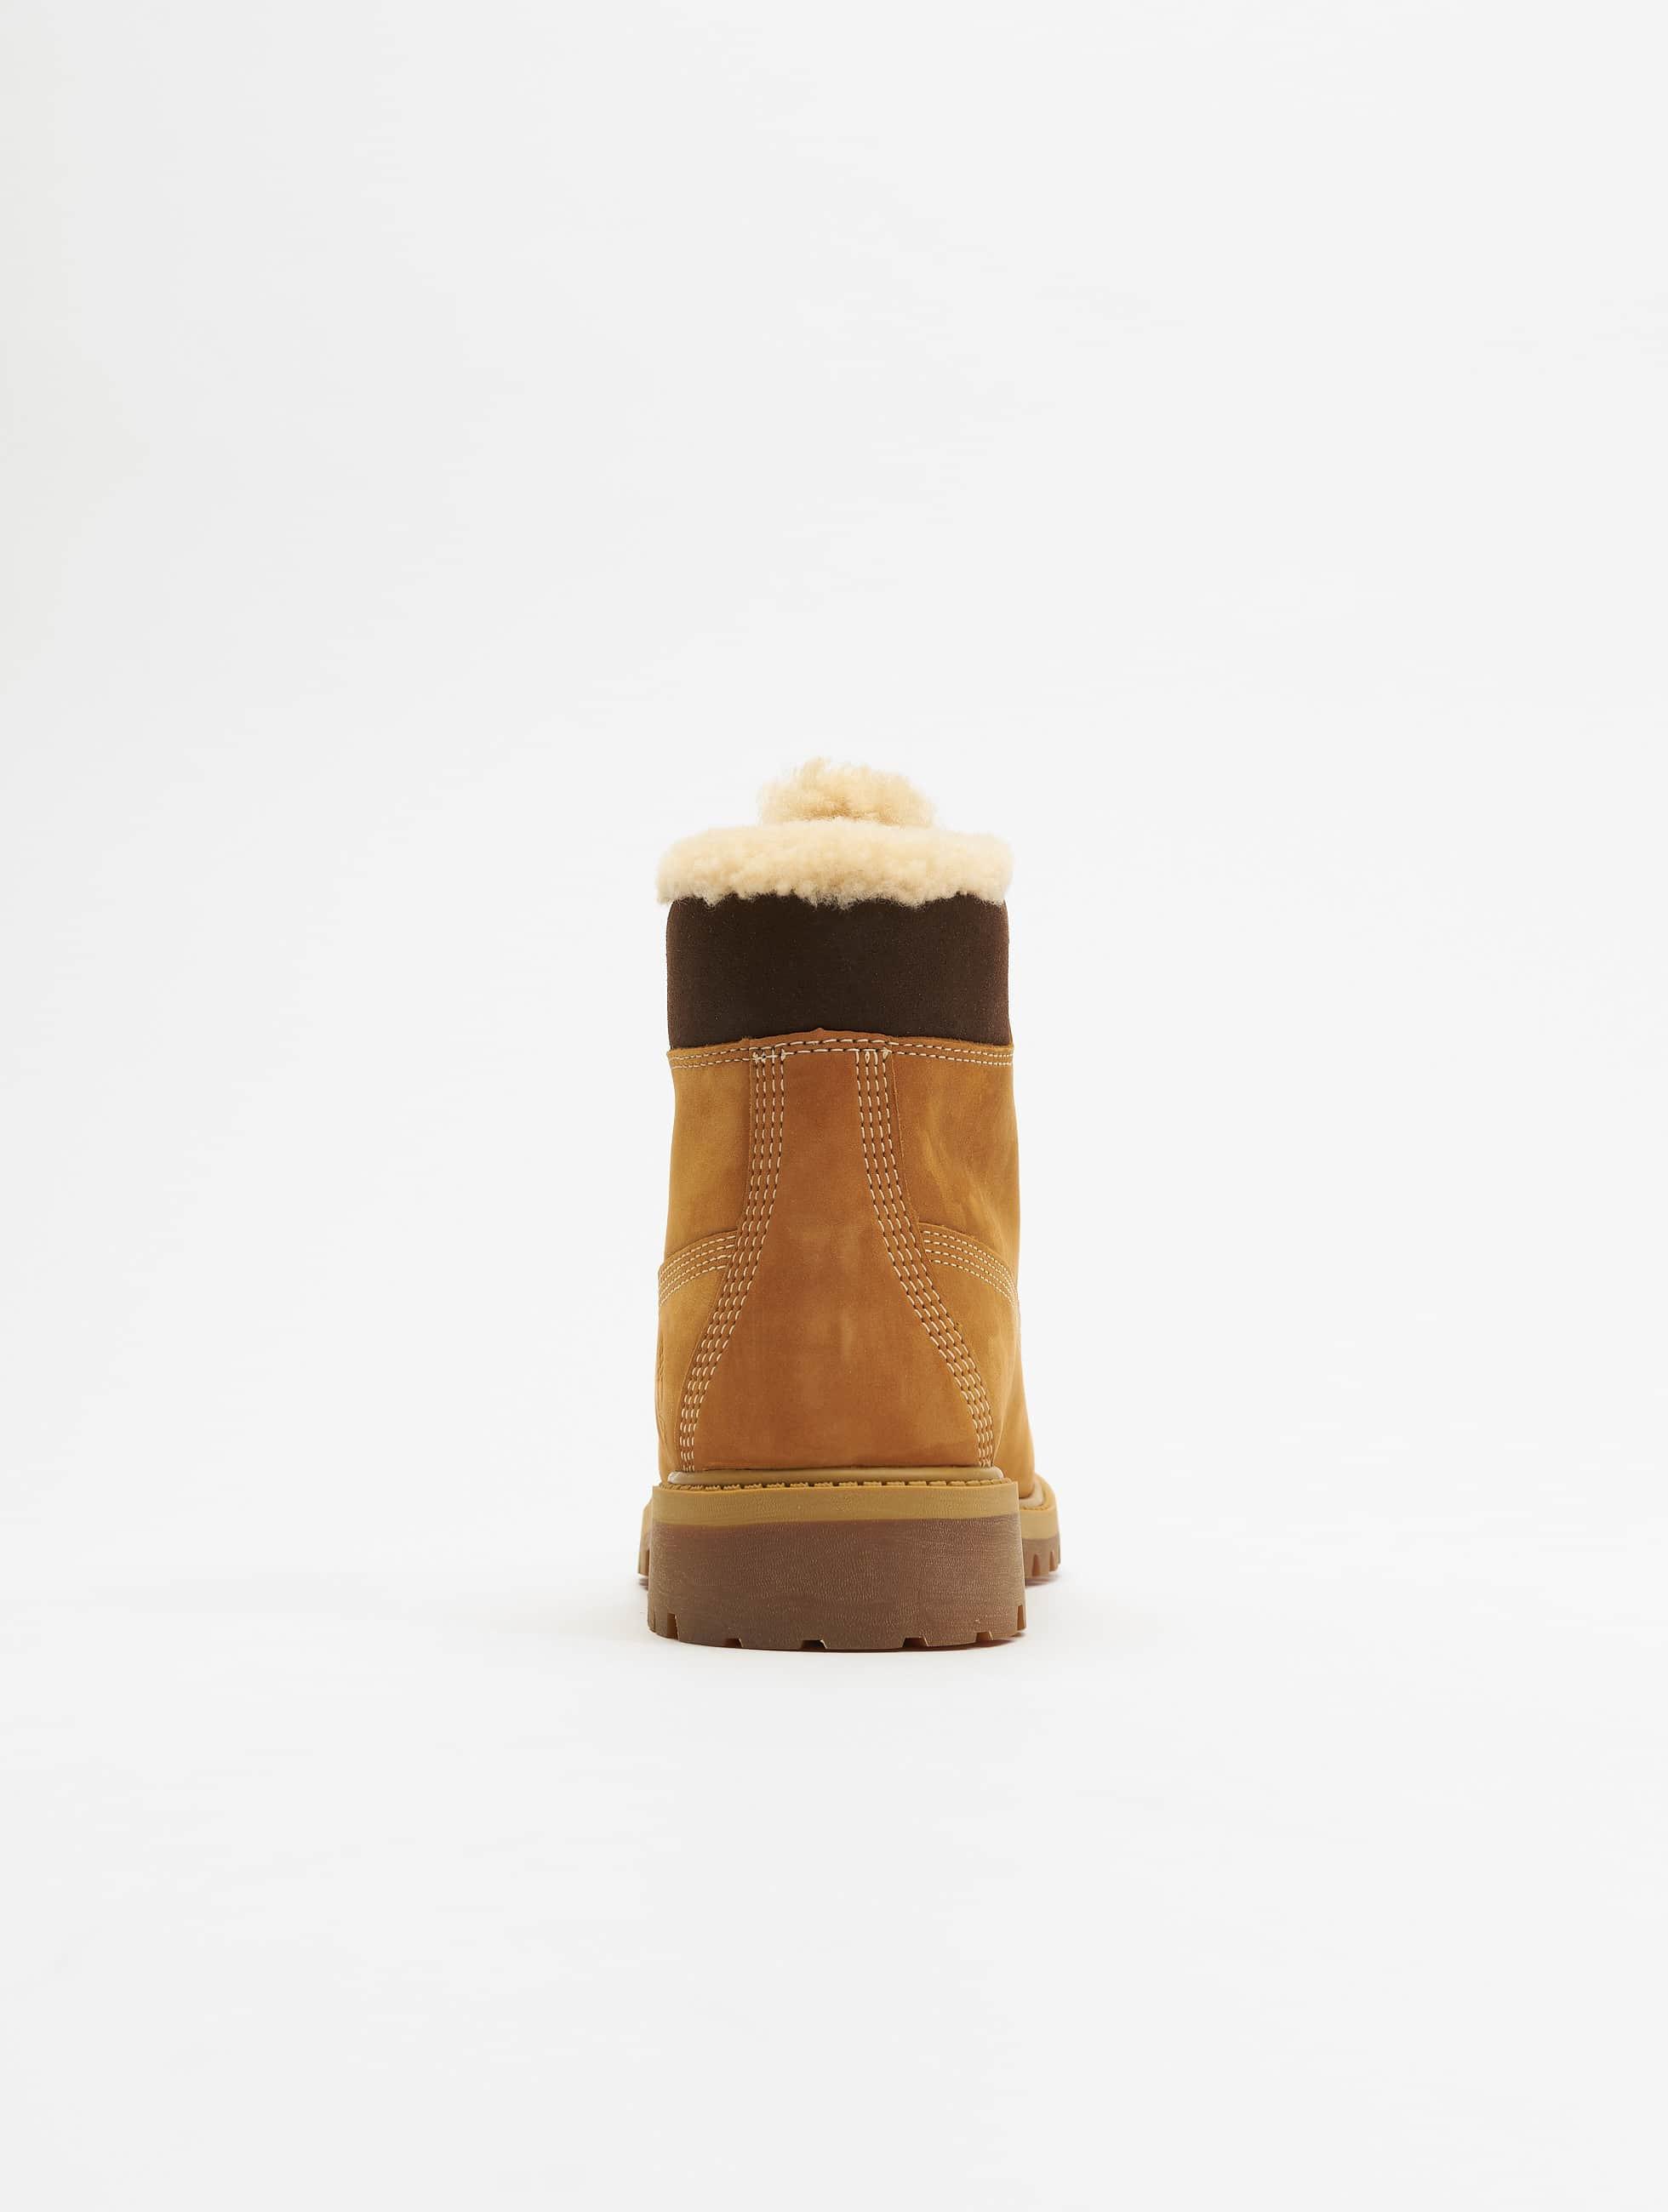 Timberland Kozaki 6 In Premium Waterproof Shearling Lined bezowy